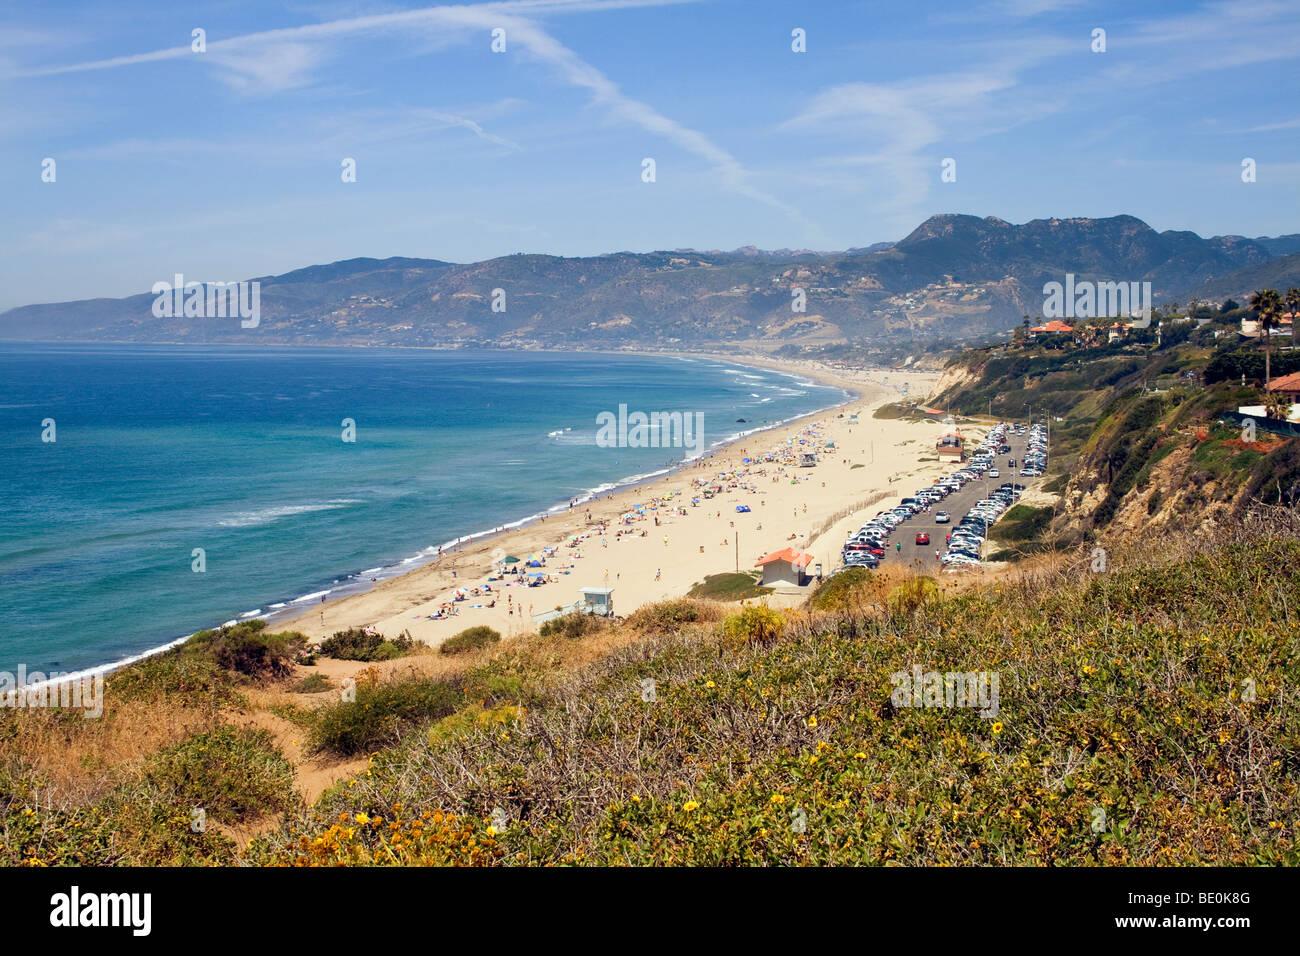 Point Dume, Malibu, California, USA Stock Photo